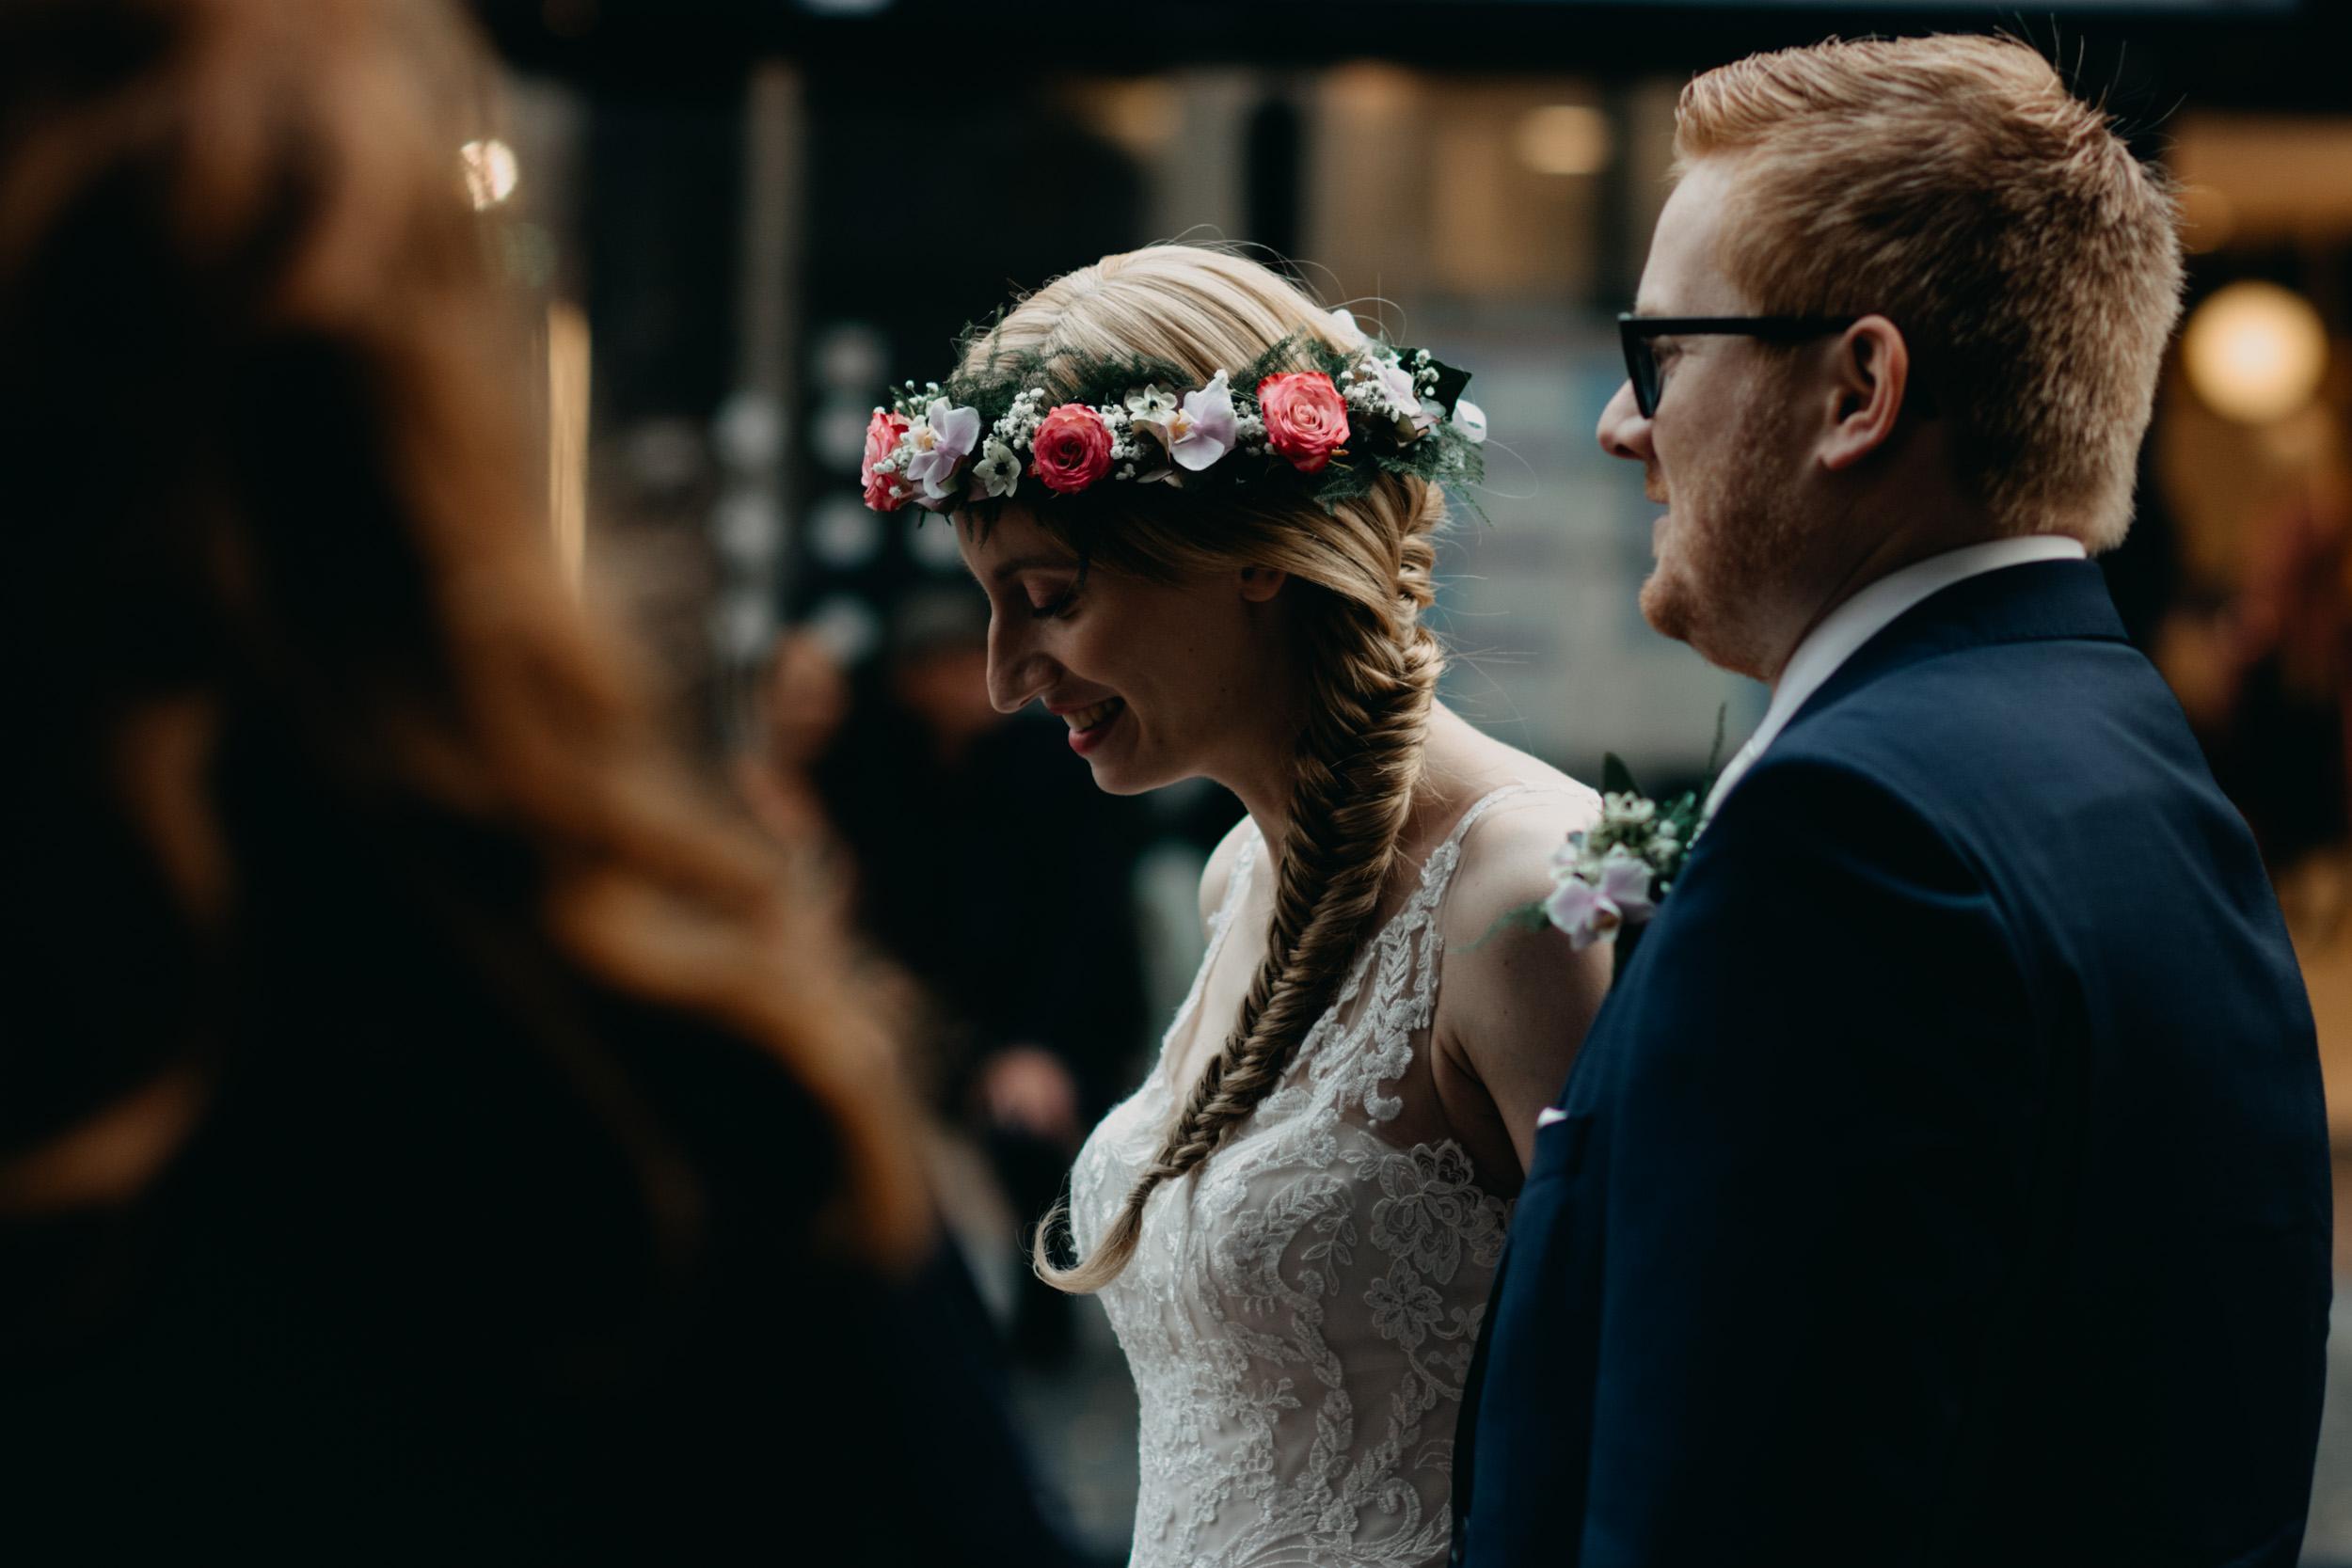 Bloemen kroon - Trouwen Nijmegen - Bruiloft